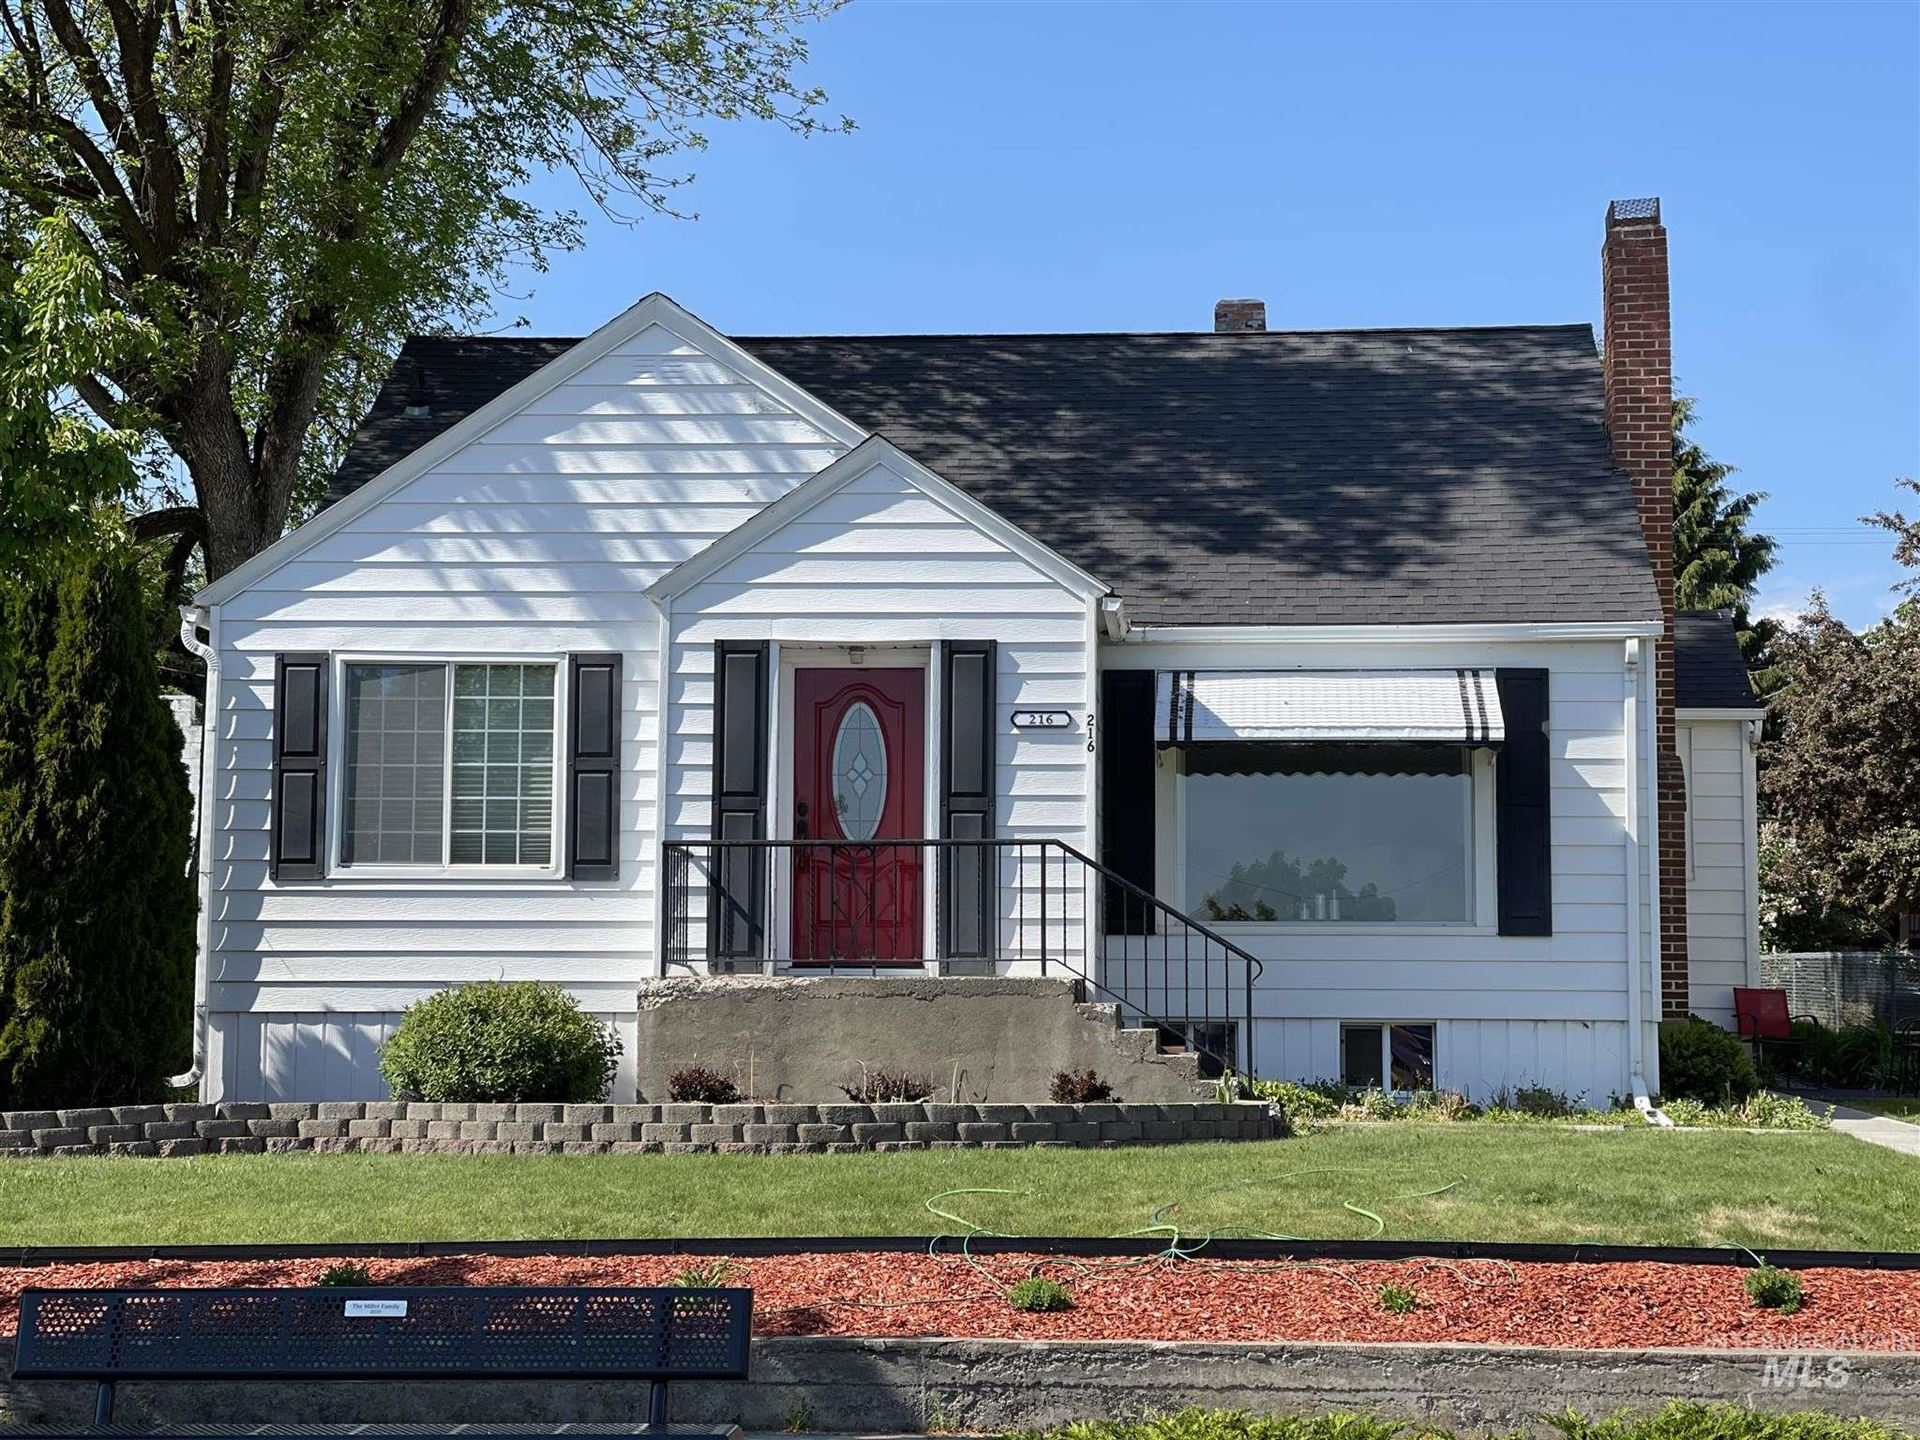 Photo of 216 W MAIN STREET, Craigmont, ID 83523 (MLS # 98806363)